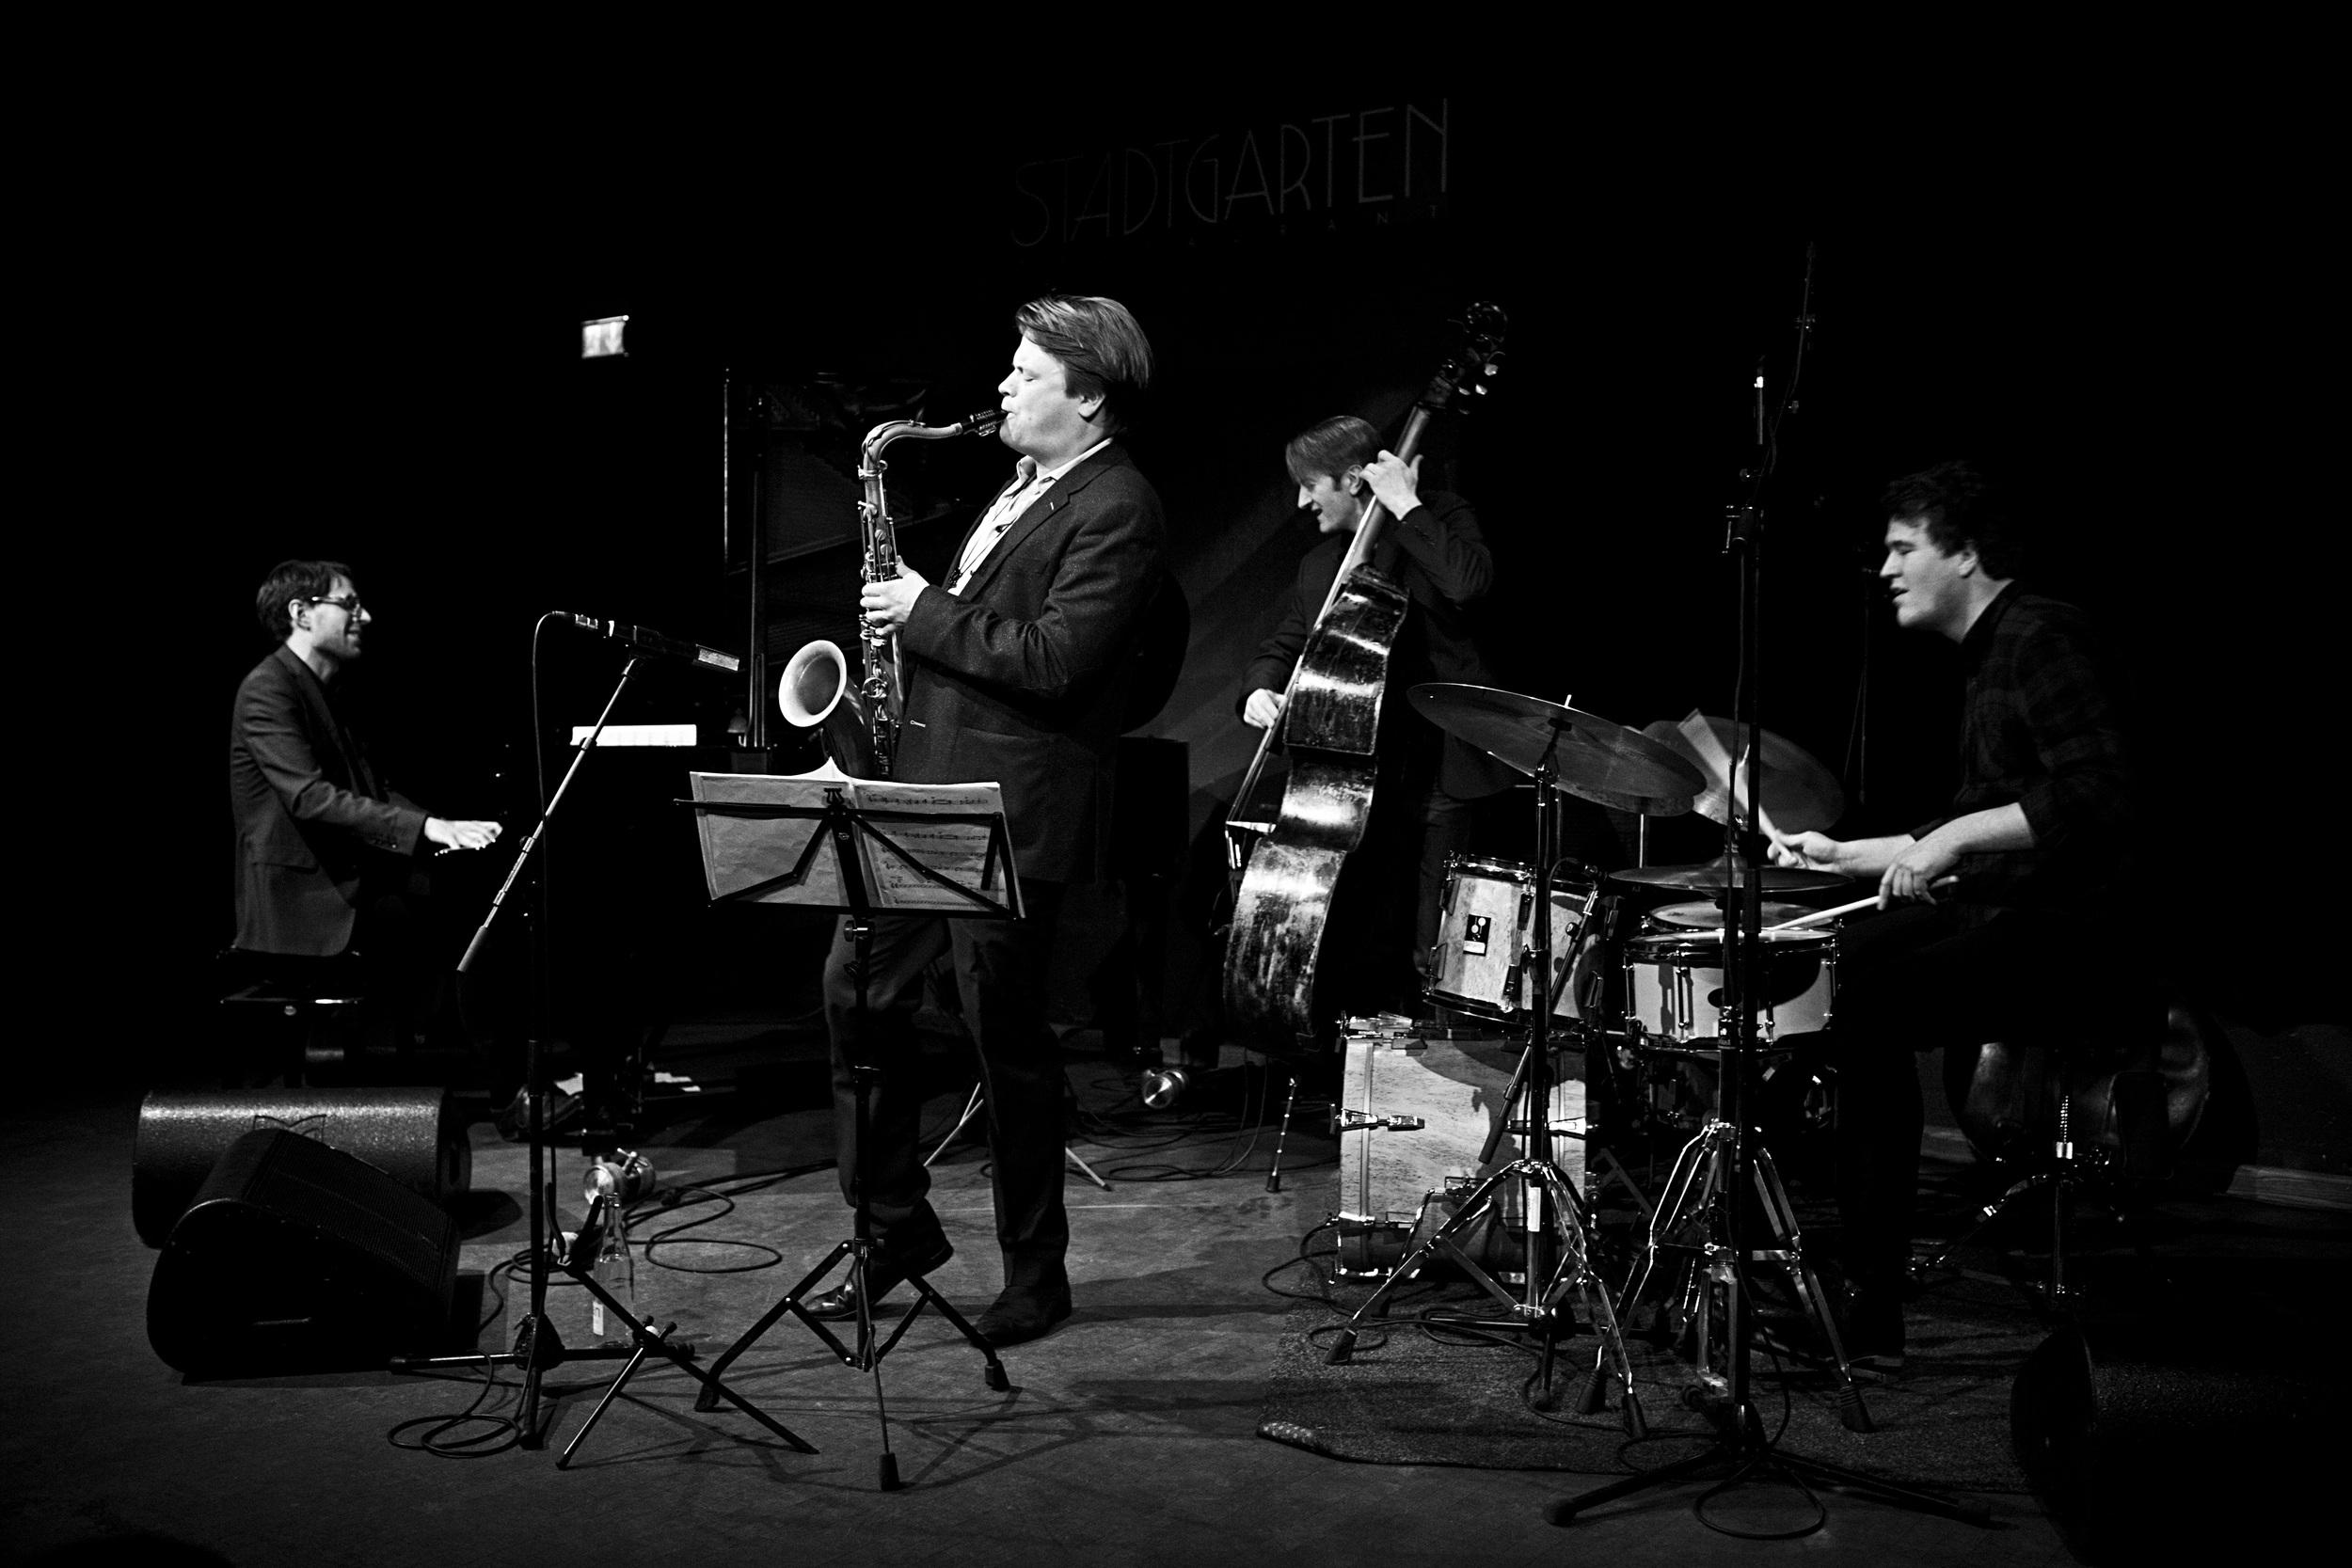 fabian stuertz 2016.02.28 - denis gäbel quartet - stadtgarten 0056-bw.jpg